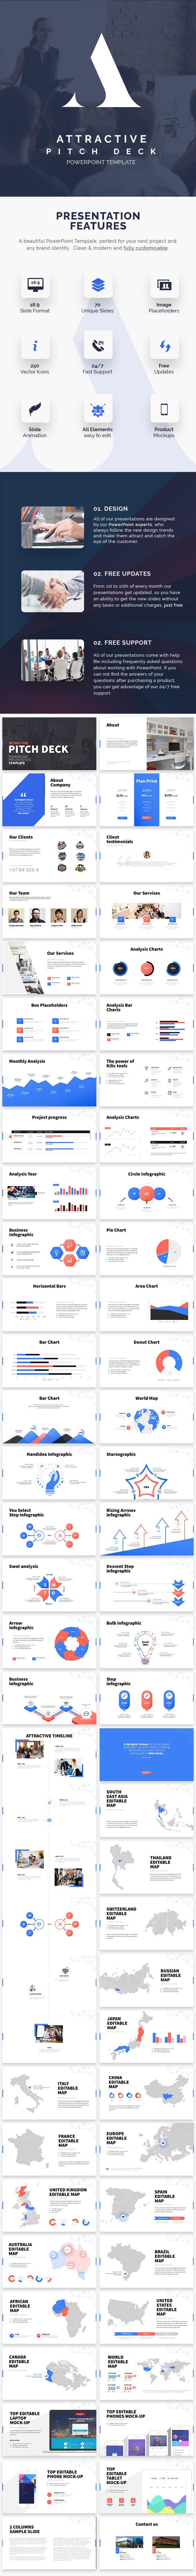 Attractive Pitch Deck - PowerPoint Presentation - Business PowerPoint Templates